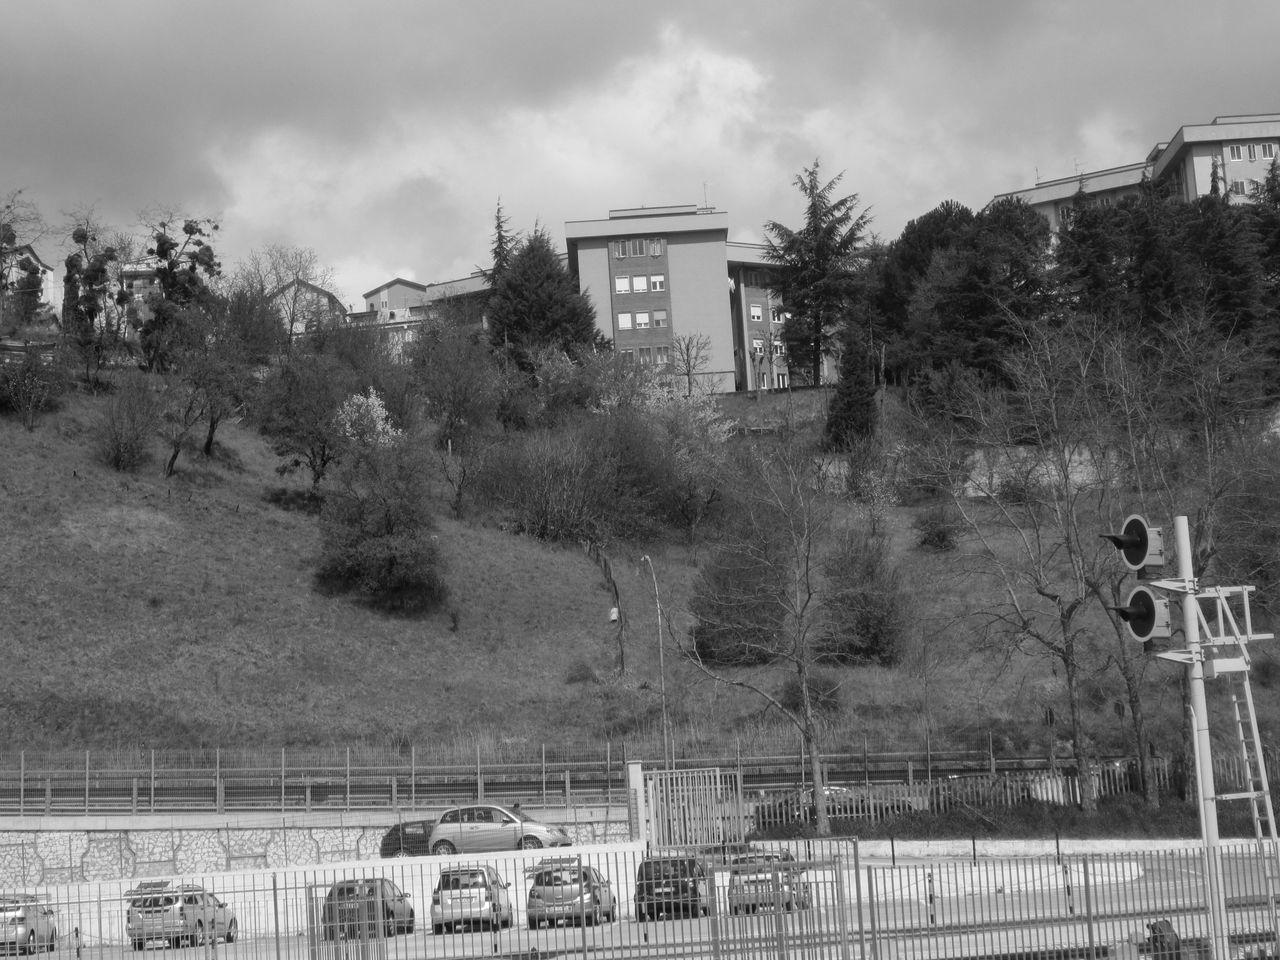 #basilicata #fotobiancoenero #fotobianconero #gallitello #italy #lucania #OldPicture #potenza #potenzainferiore #urban #urbanphotography Italia